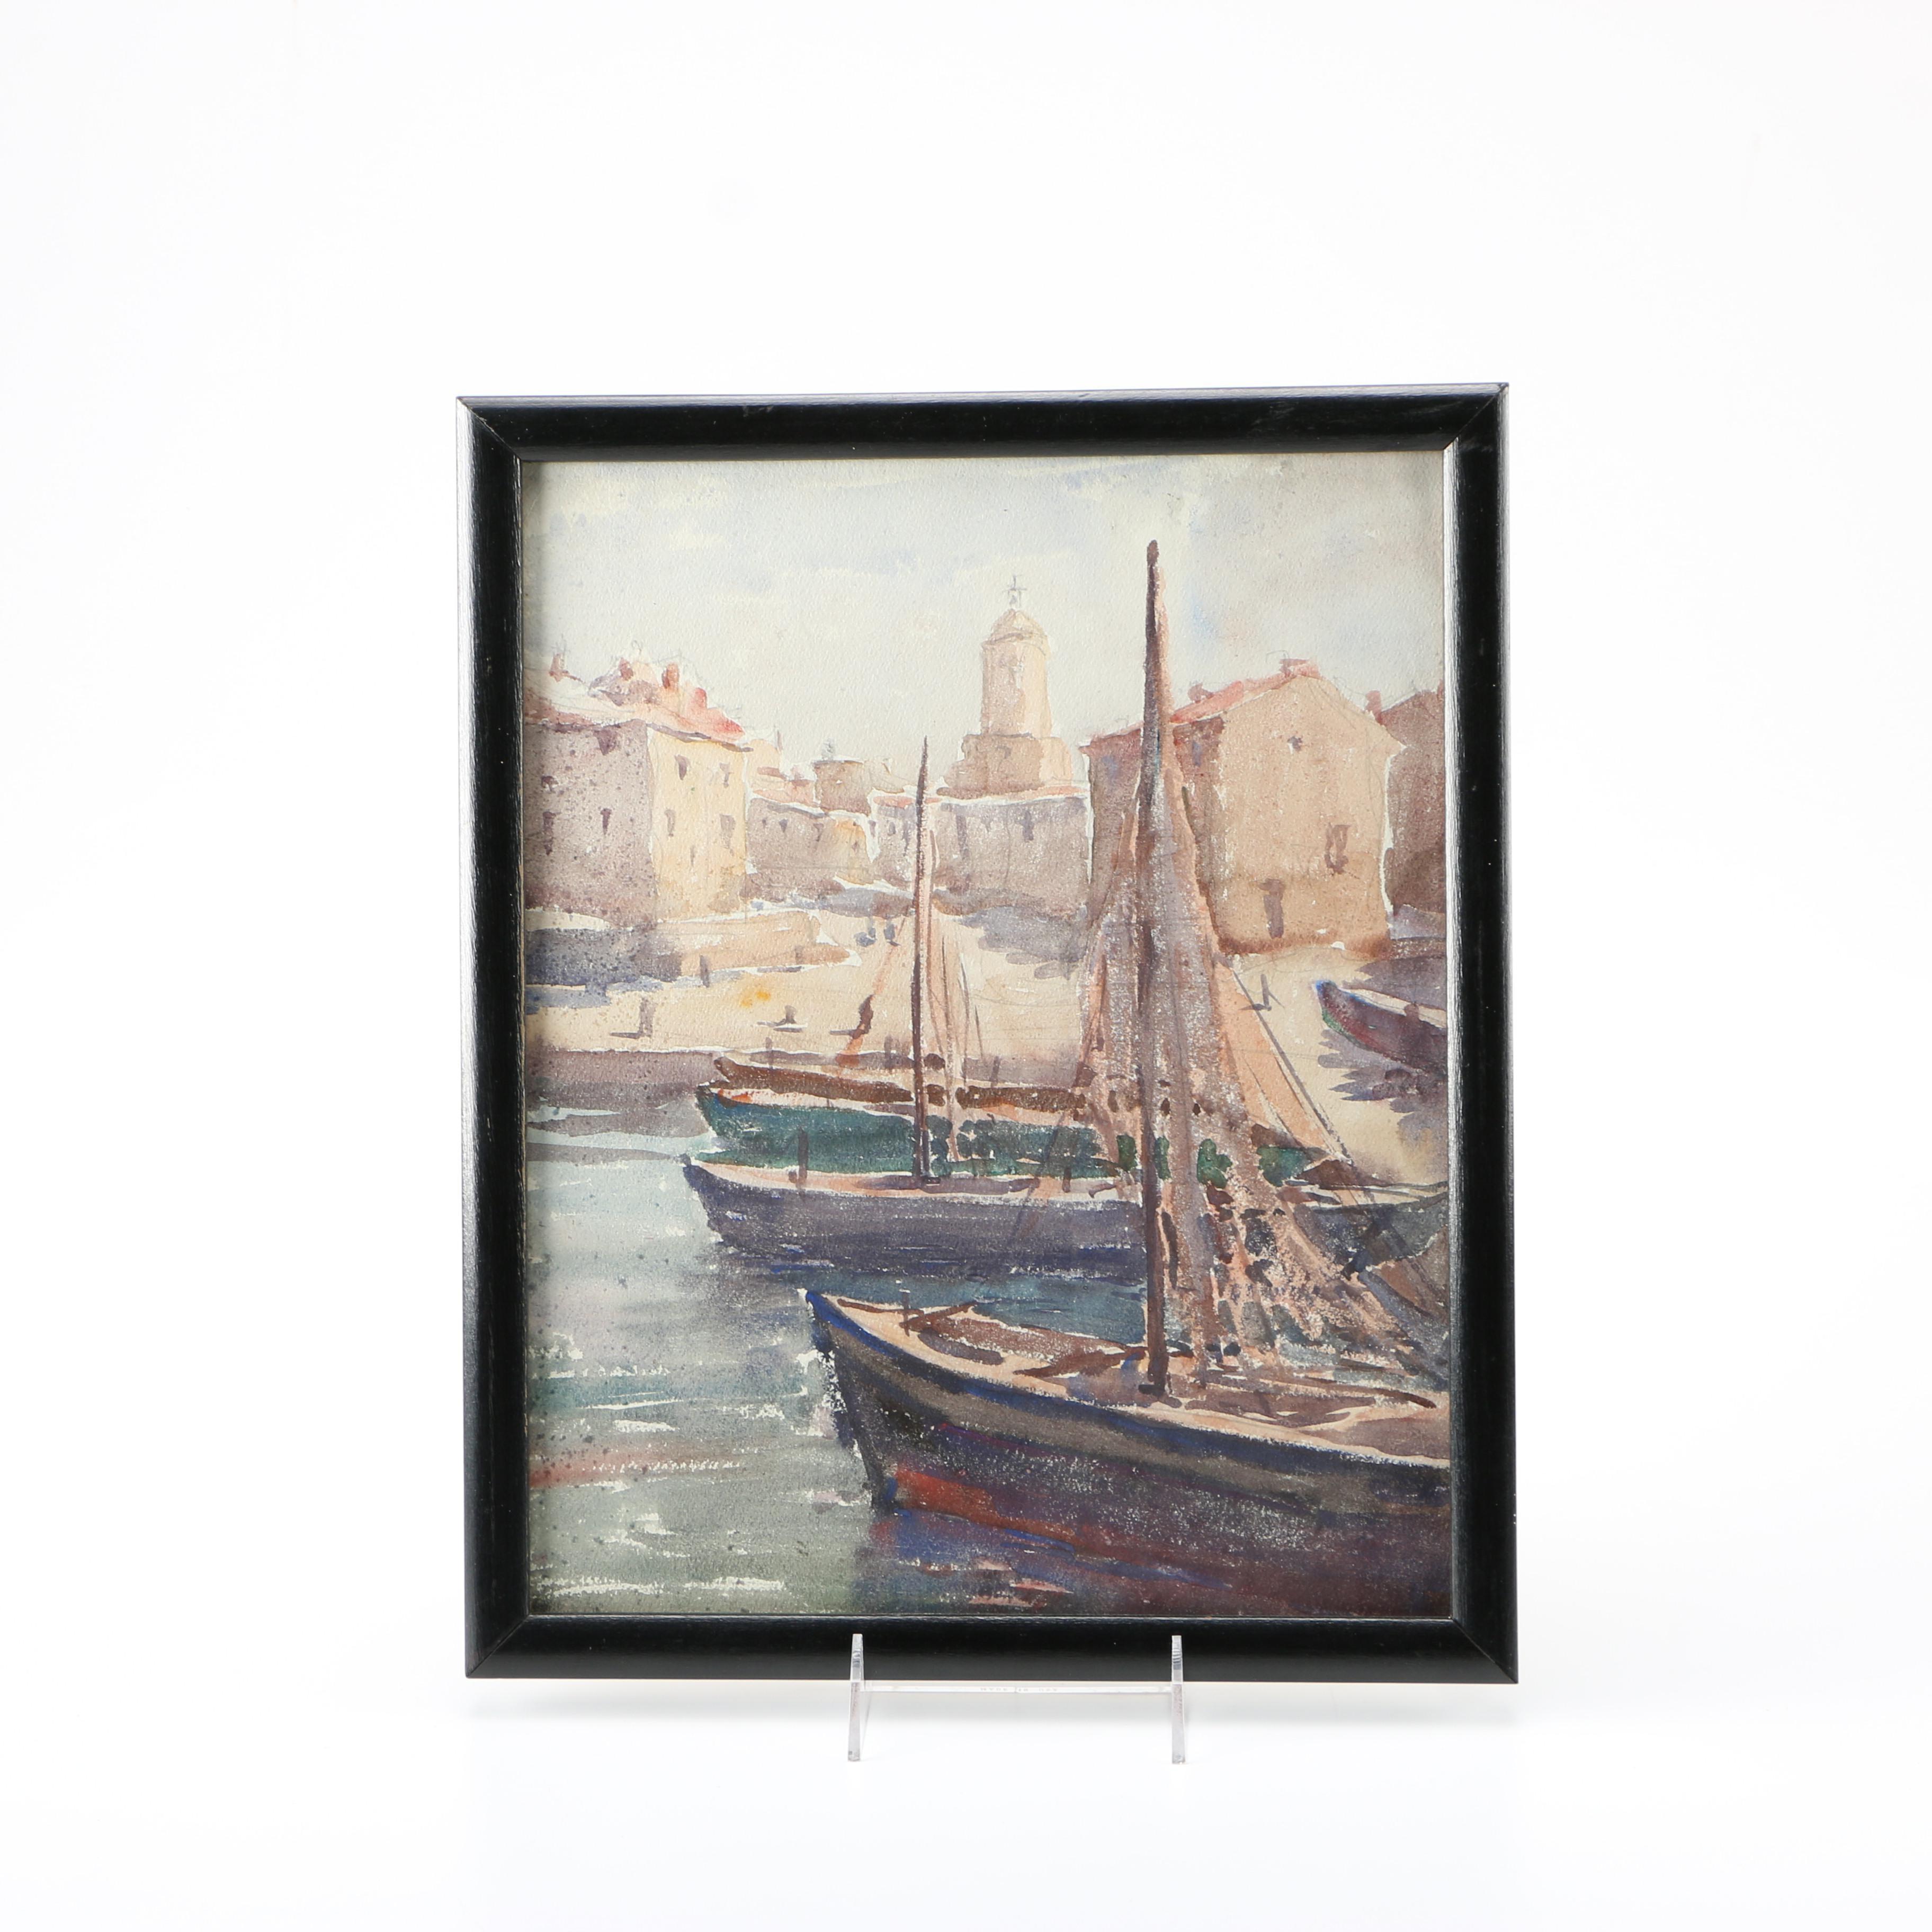 Raoul Monory Original Watercolor of Harbored Sailboats